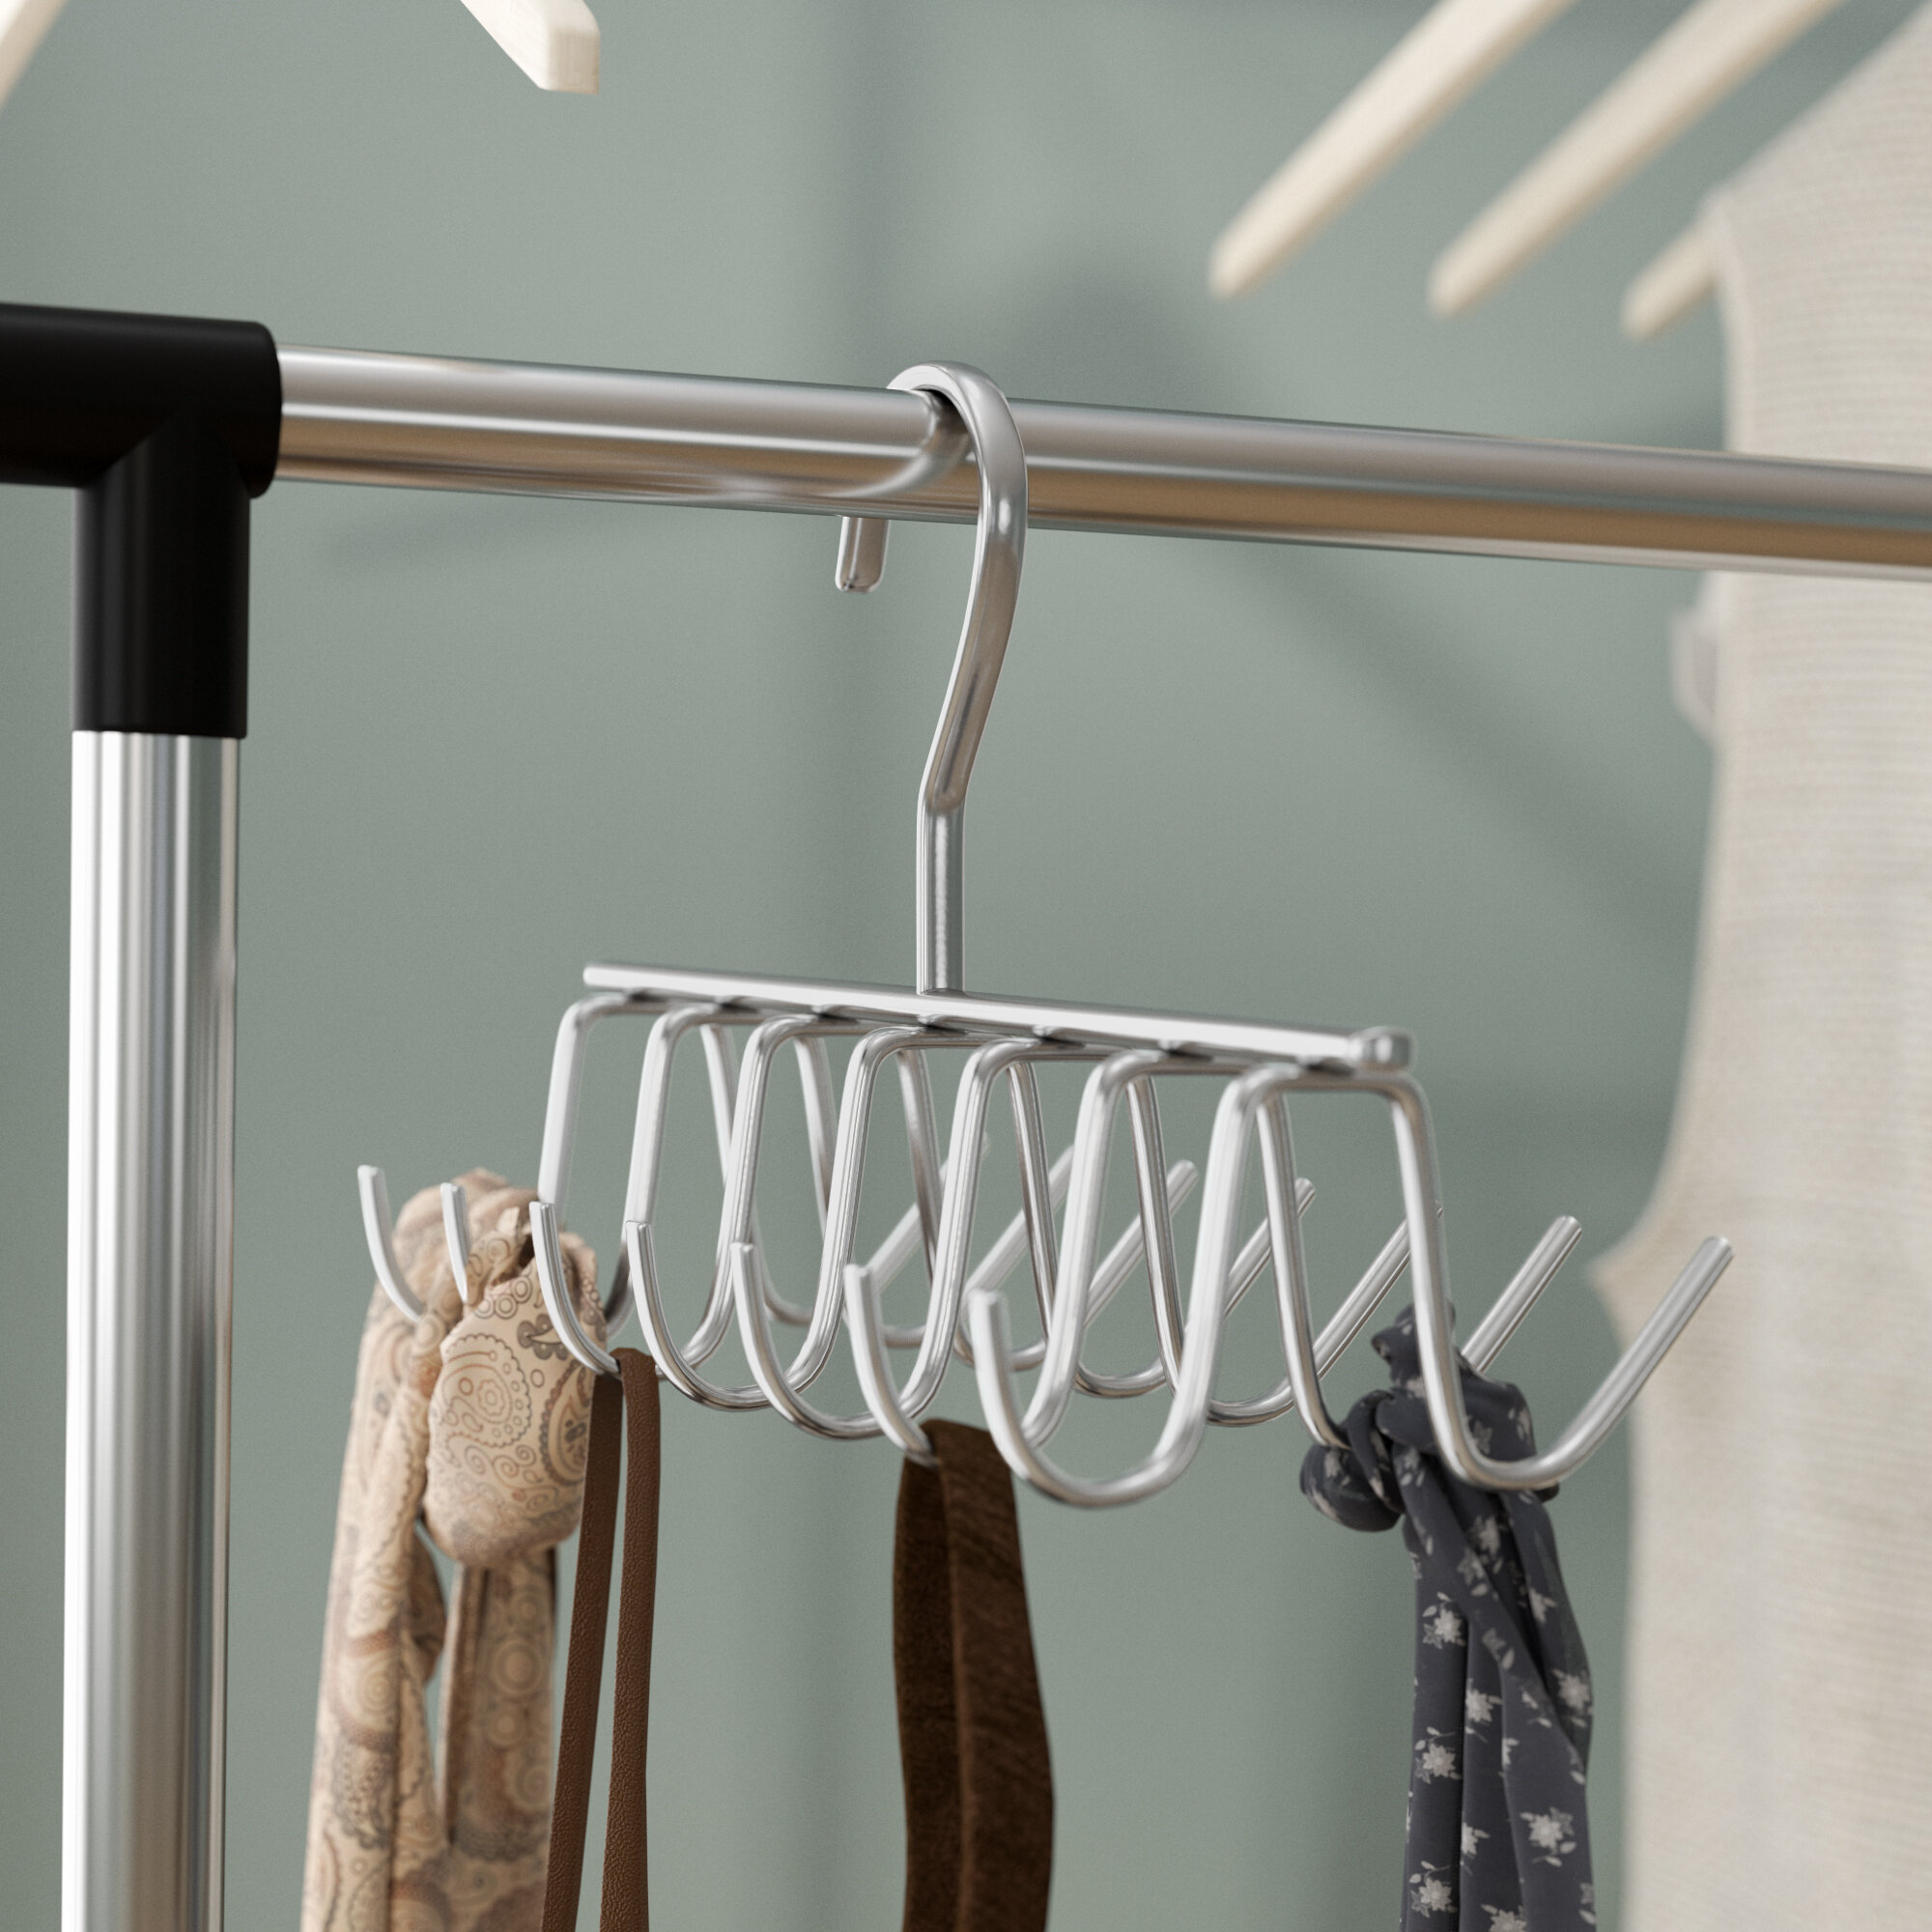 Tie Belt Scarf Hanger 20 Chrome Bars Hanging Rack Holder Storage Organiser Wood